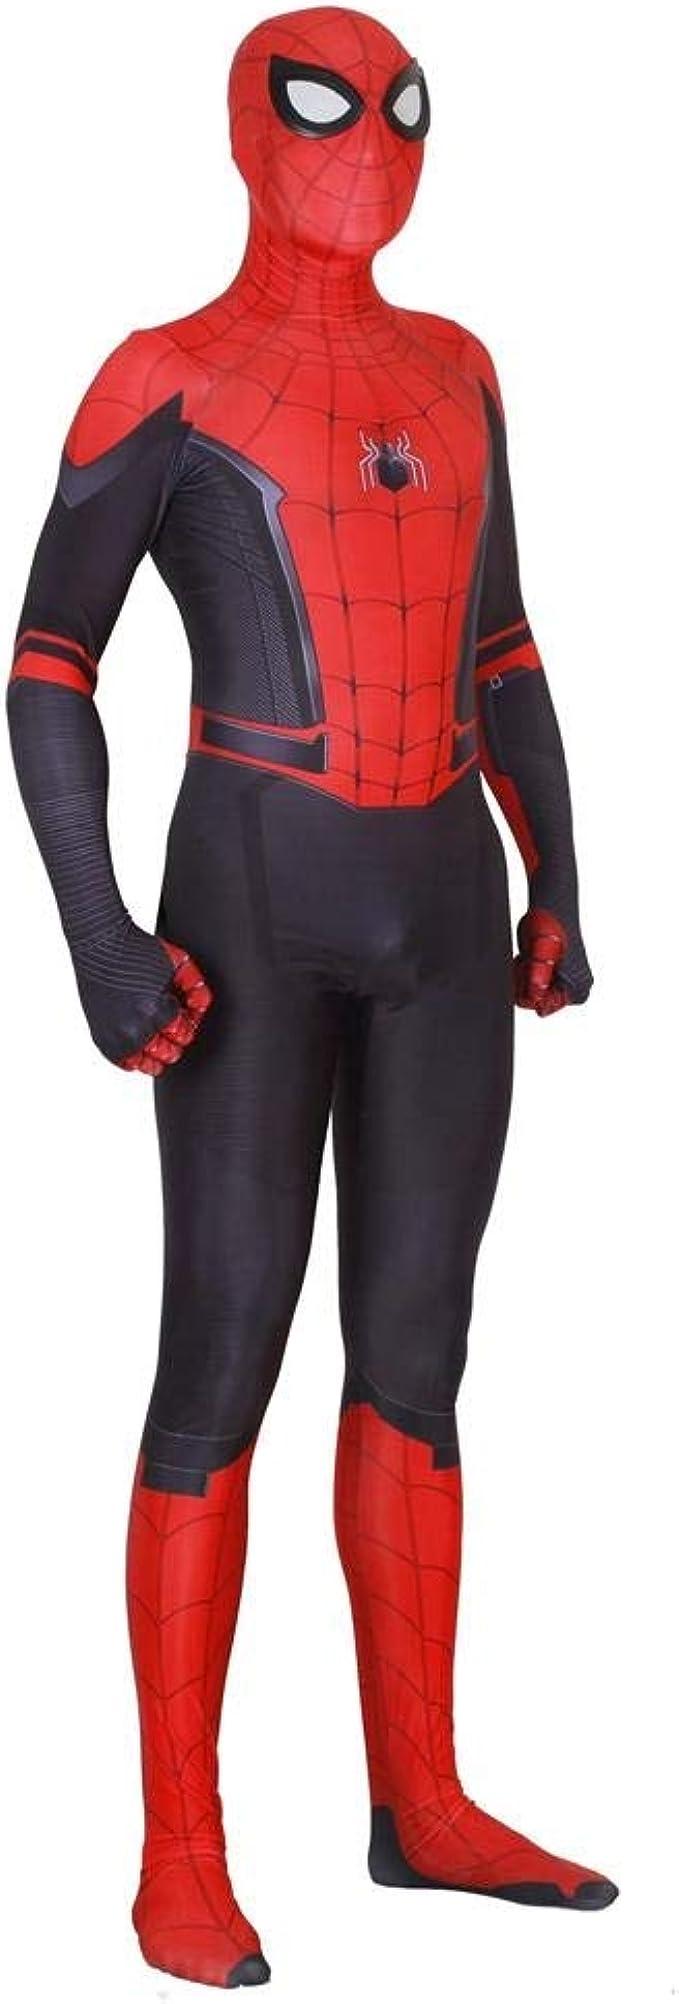 Cosplay Disfraz Spider-Man Far from Home (S Tamaño): Amazon.es ...